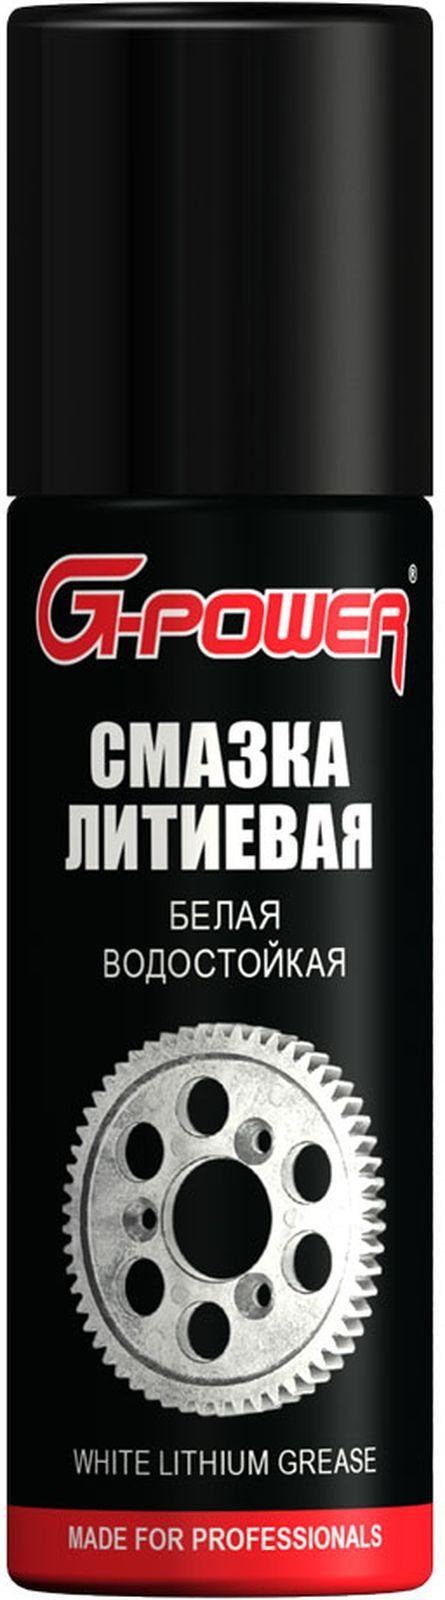 Смазка G-Power, белая, литиевая, с тефлоном, 90 мл